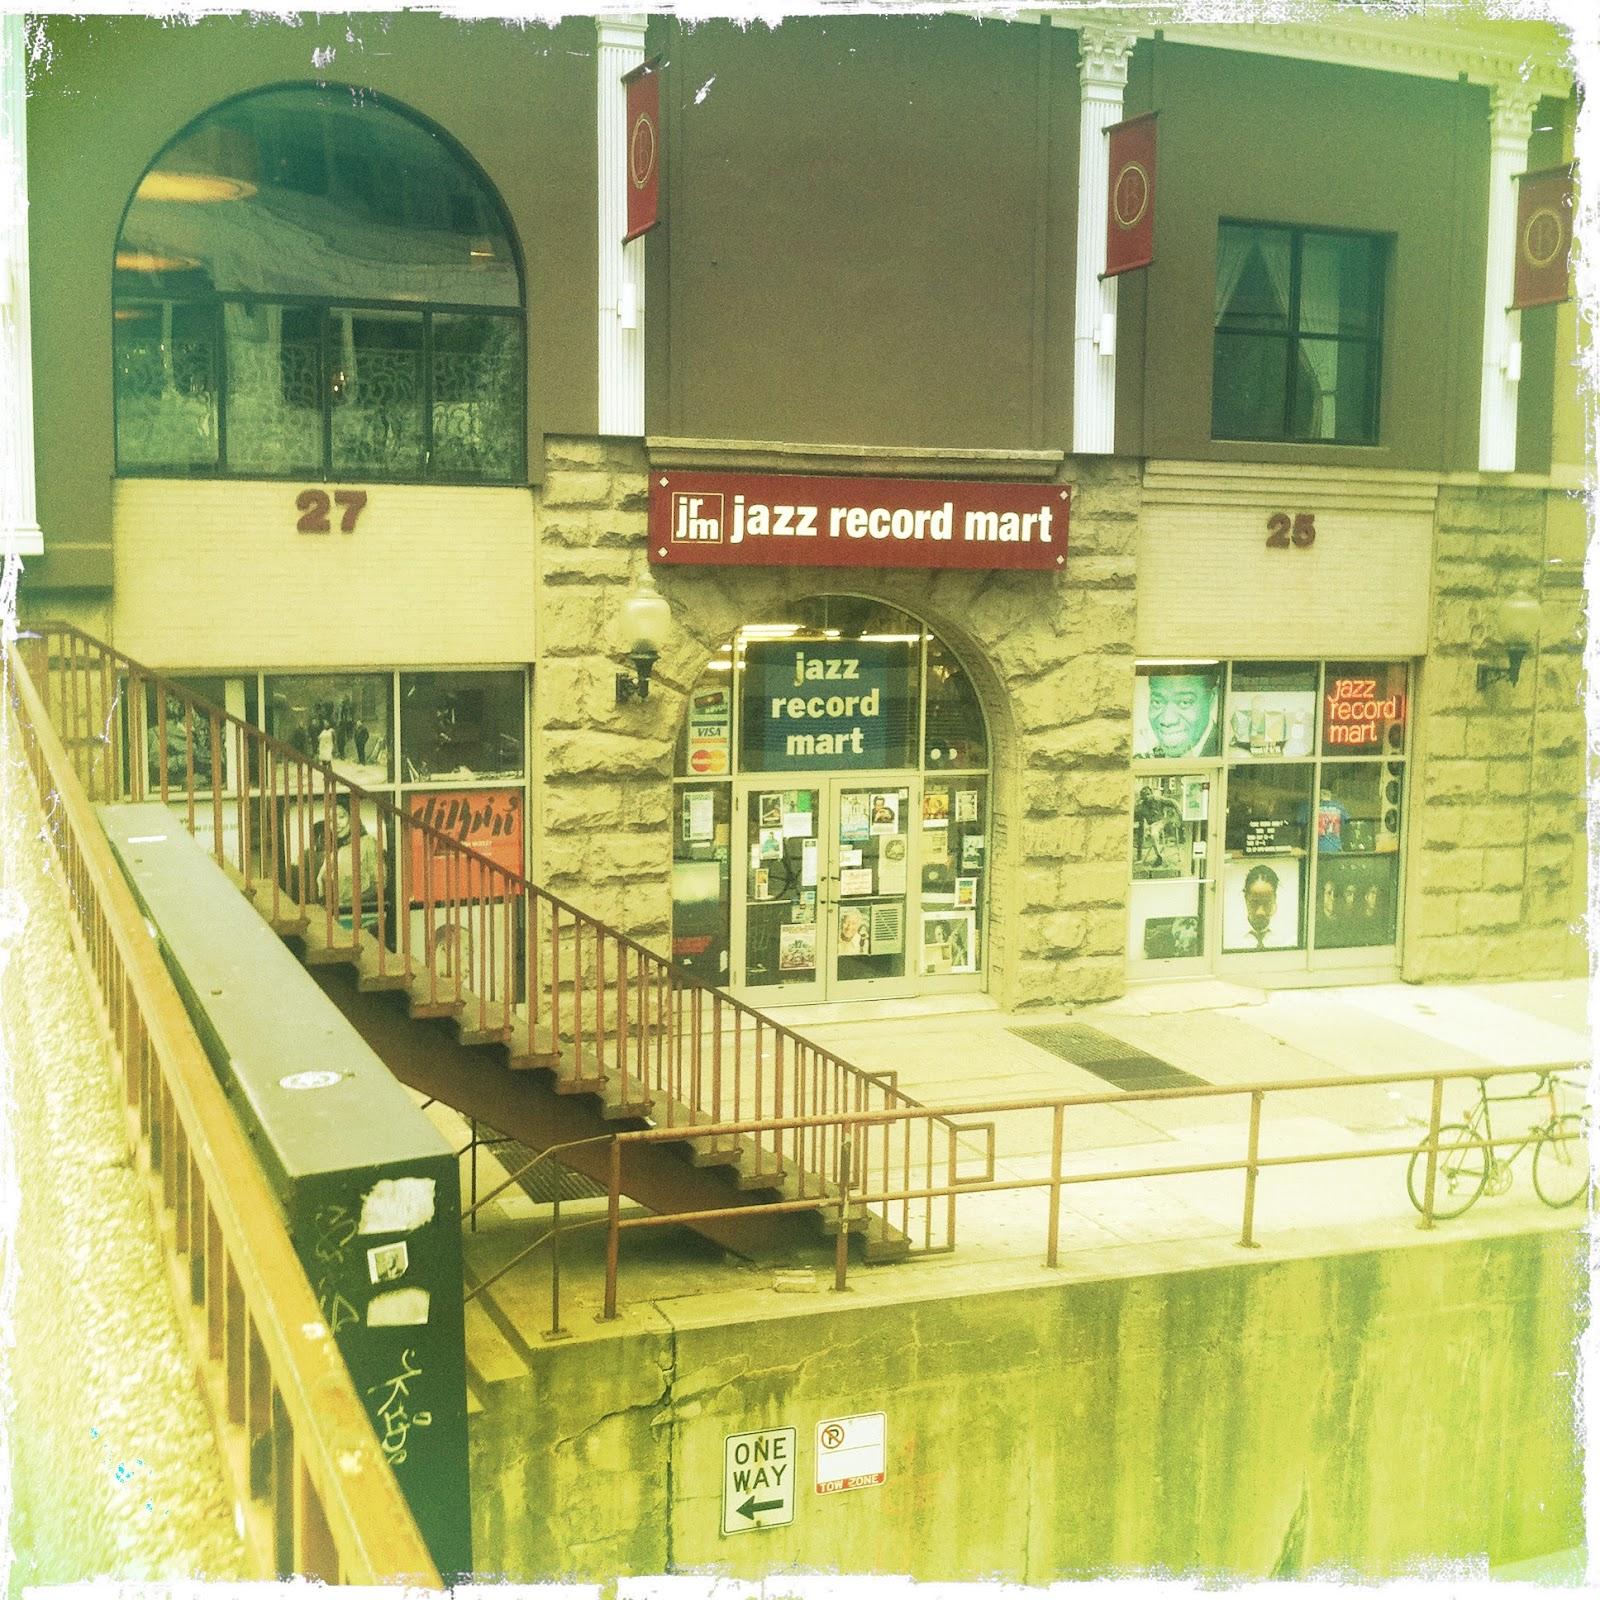 Chicago Lighting Stores: The Hertz Beat: Chicago's Record Store Gems: Funk, Jazz